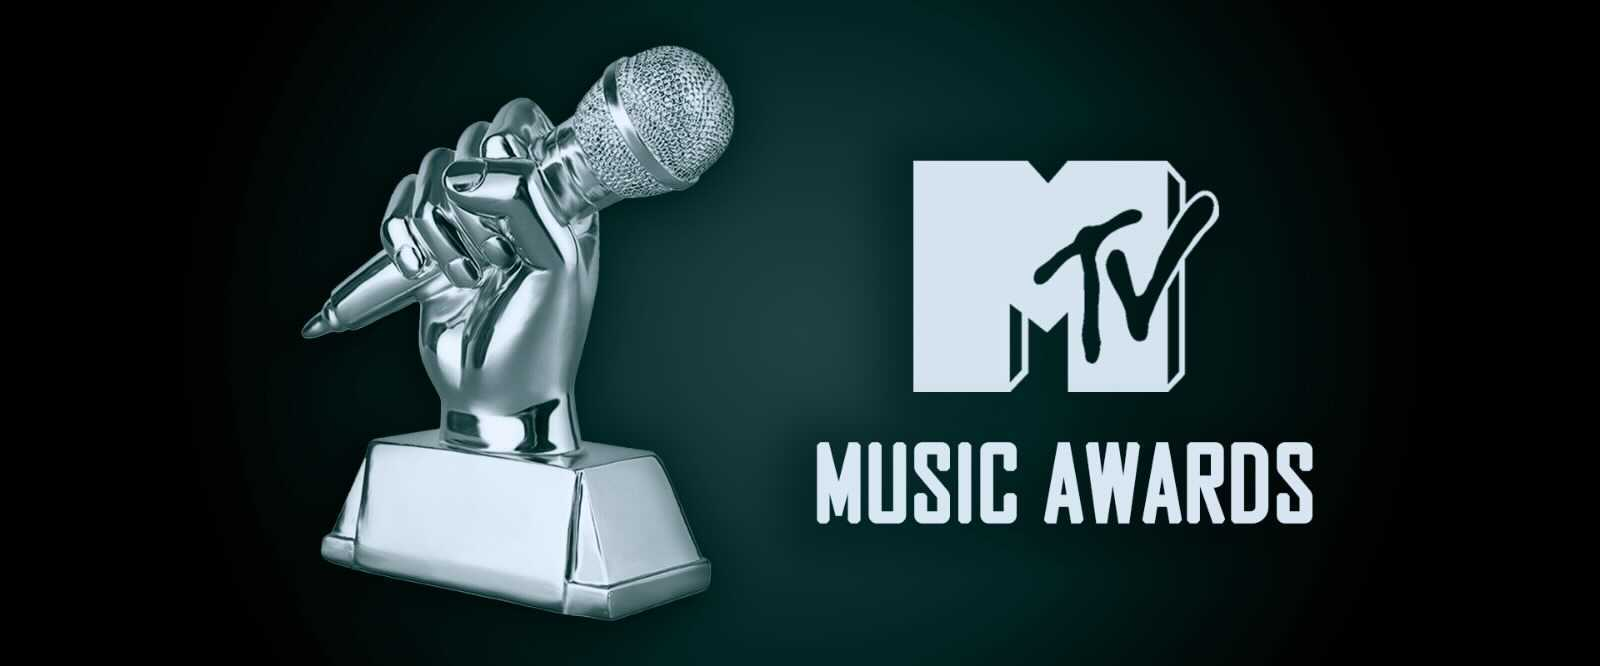 imagen_mtv_awards_horizontal